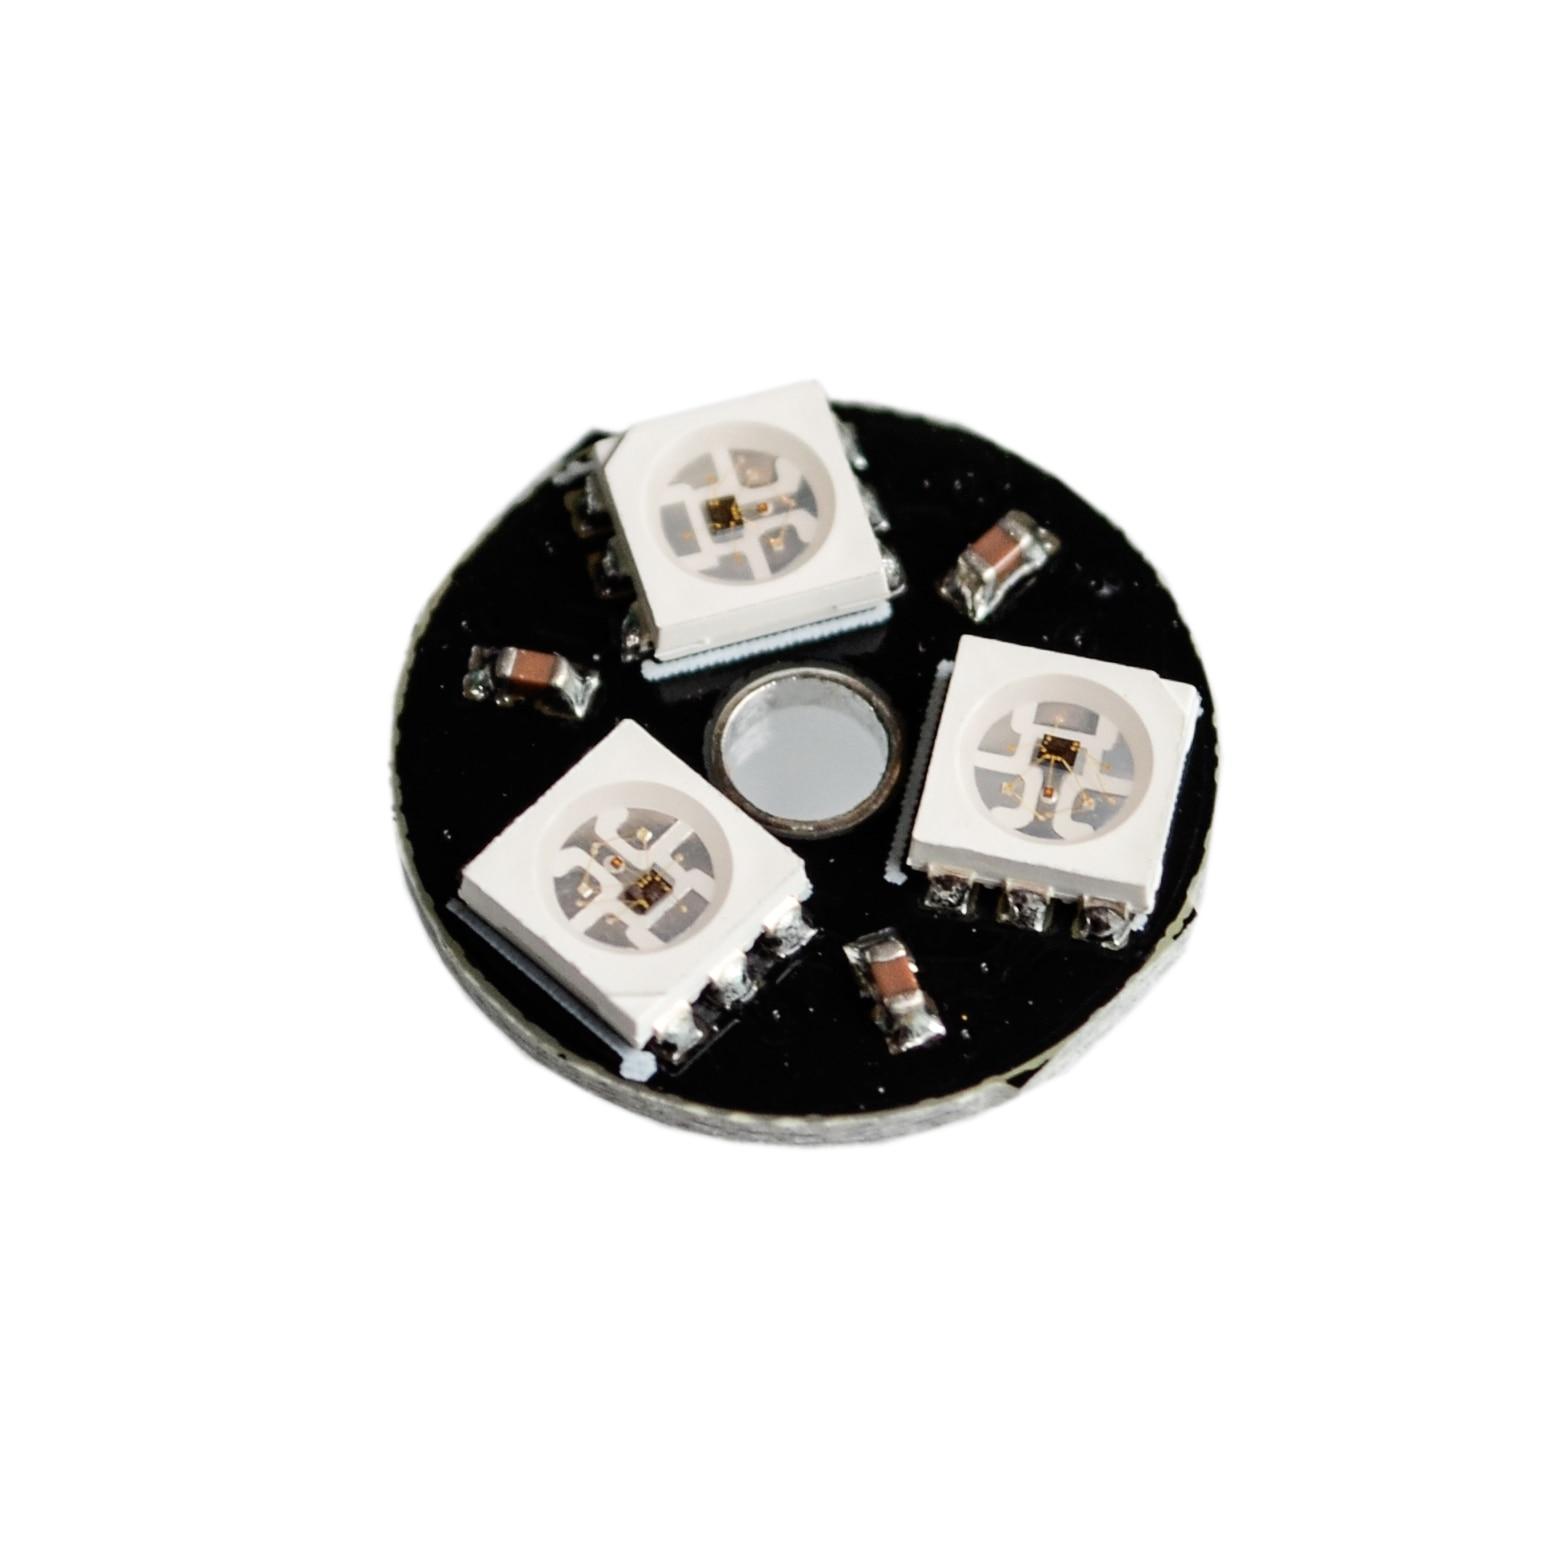 Integrated Circuits Active Components 1pcs X Ws2812b 5050 Rgb Led Full Color Driver 25-bit Lantern Development Board Evident Effect